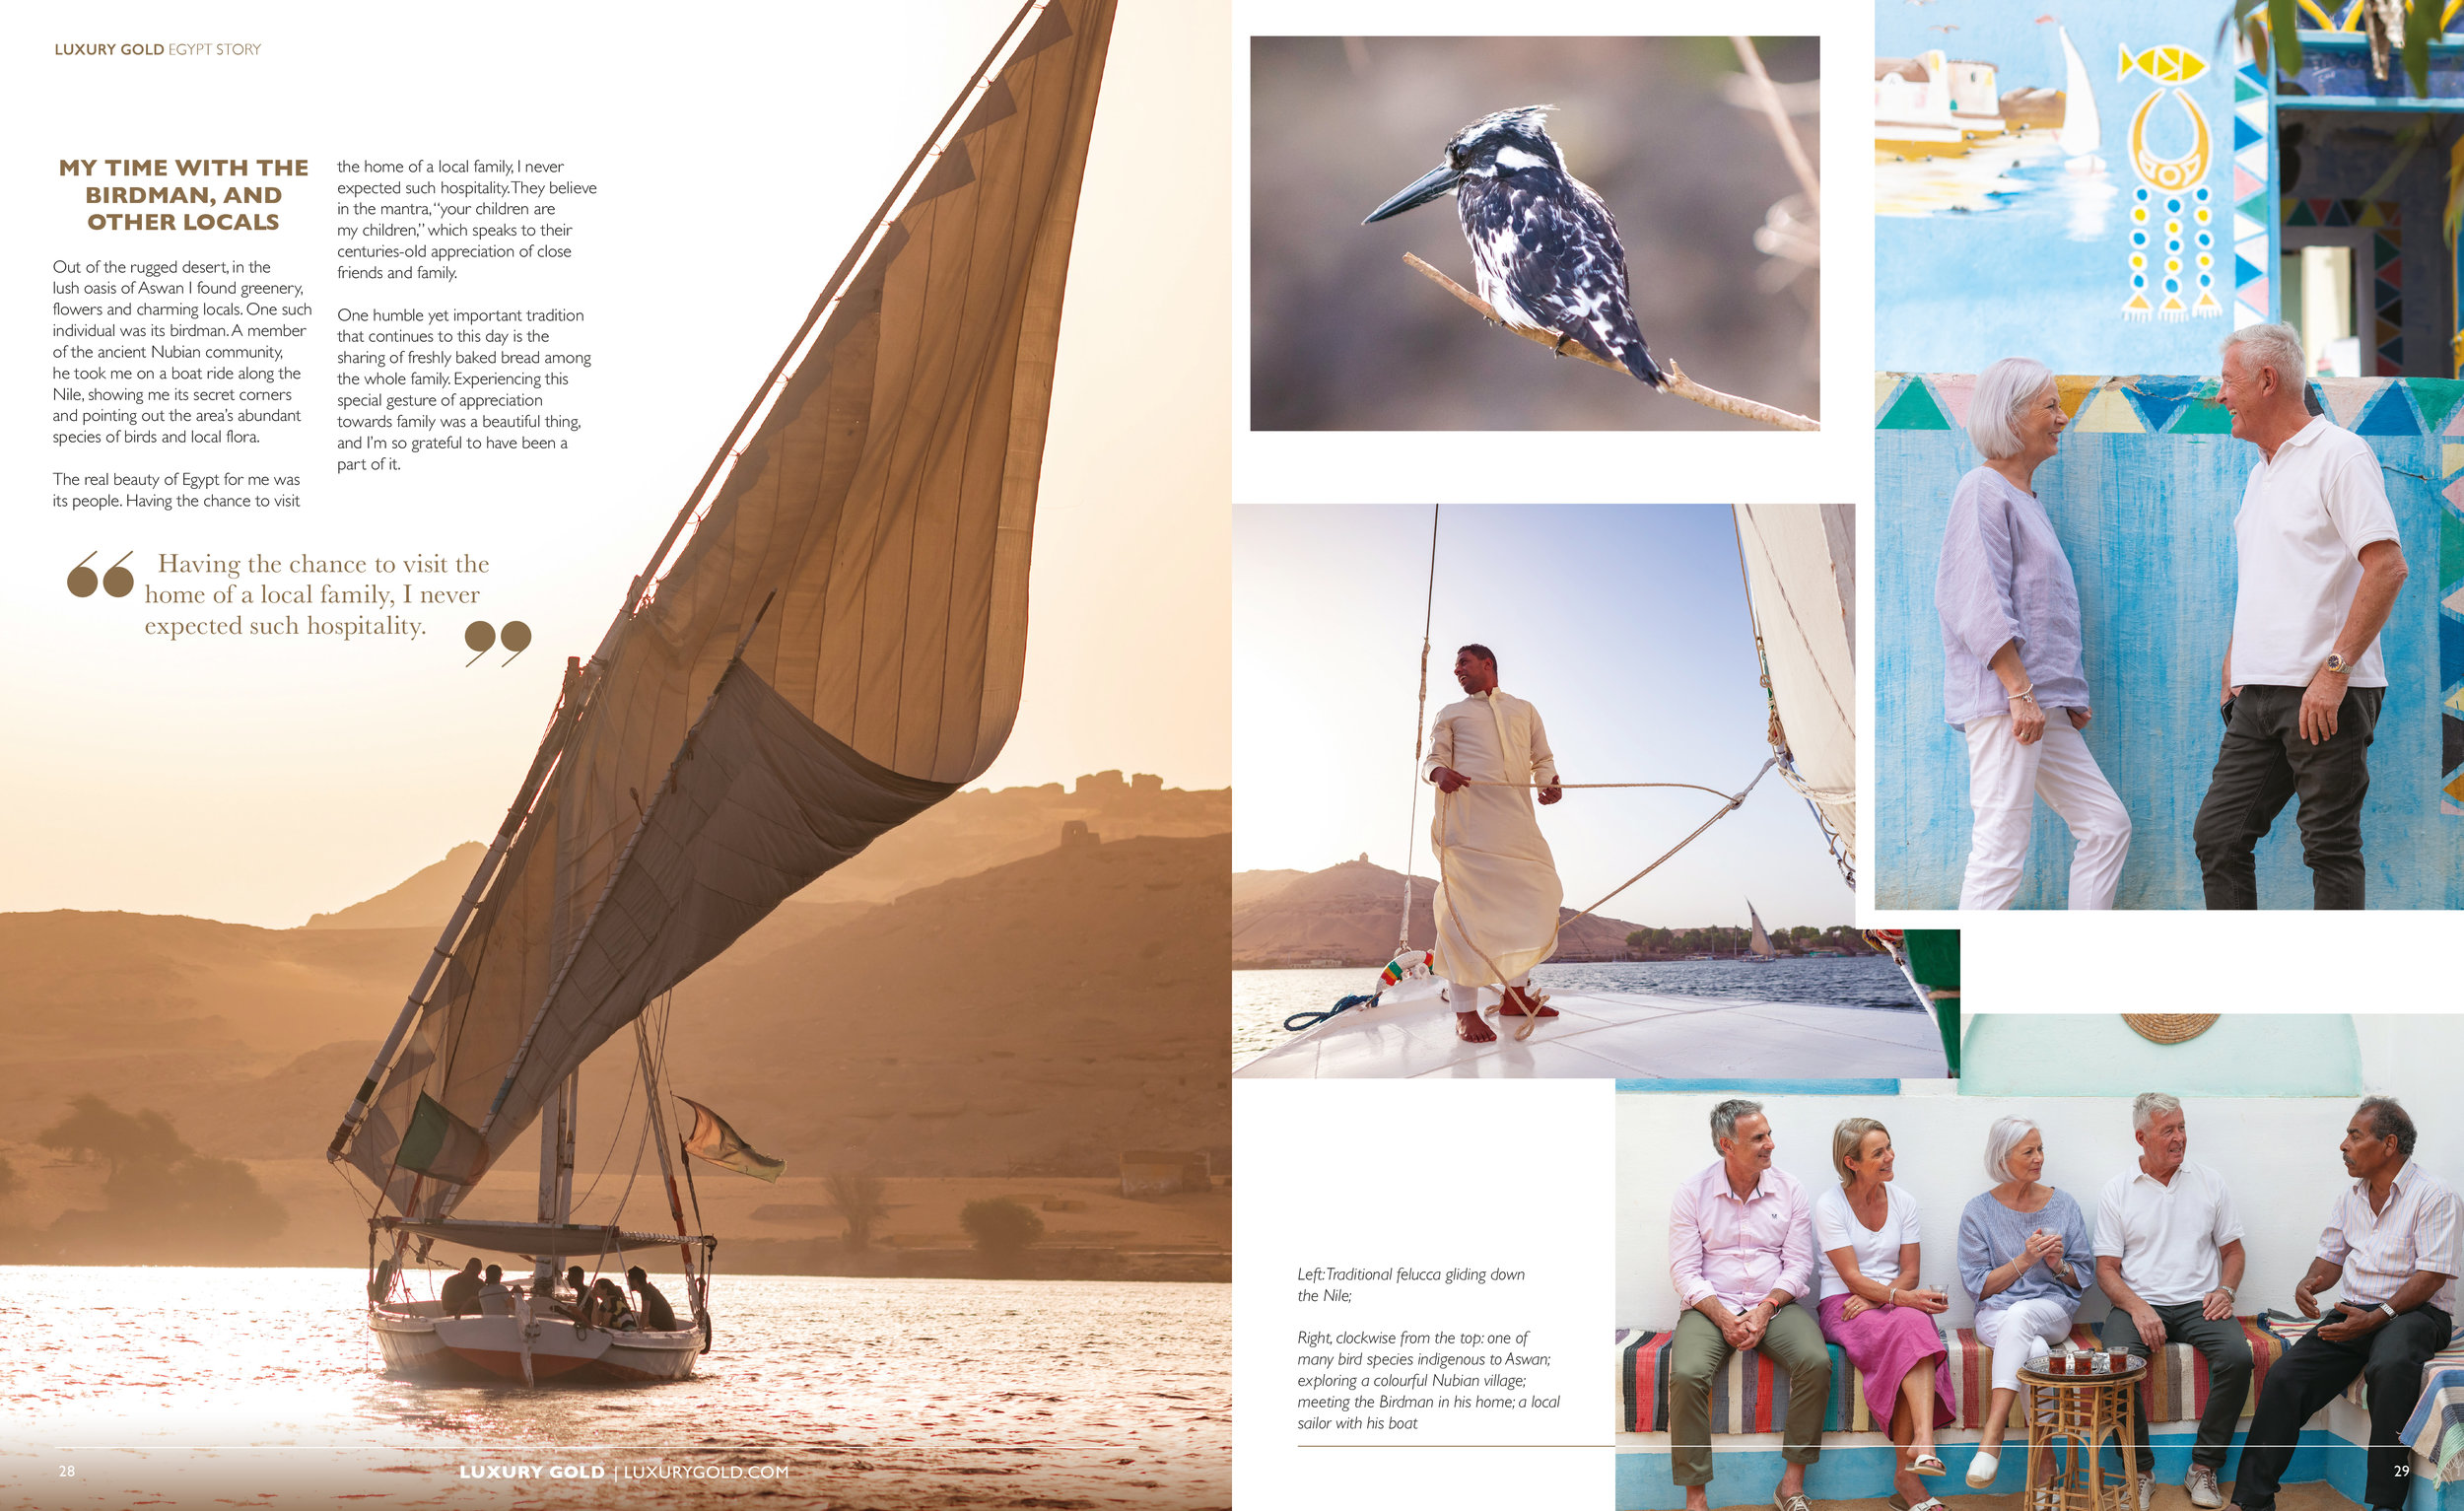 LG-Brochure-2020-p28-29.jpg